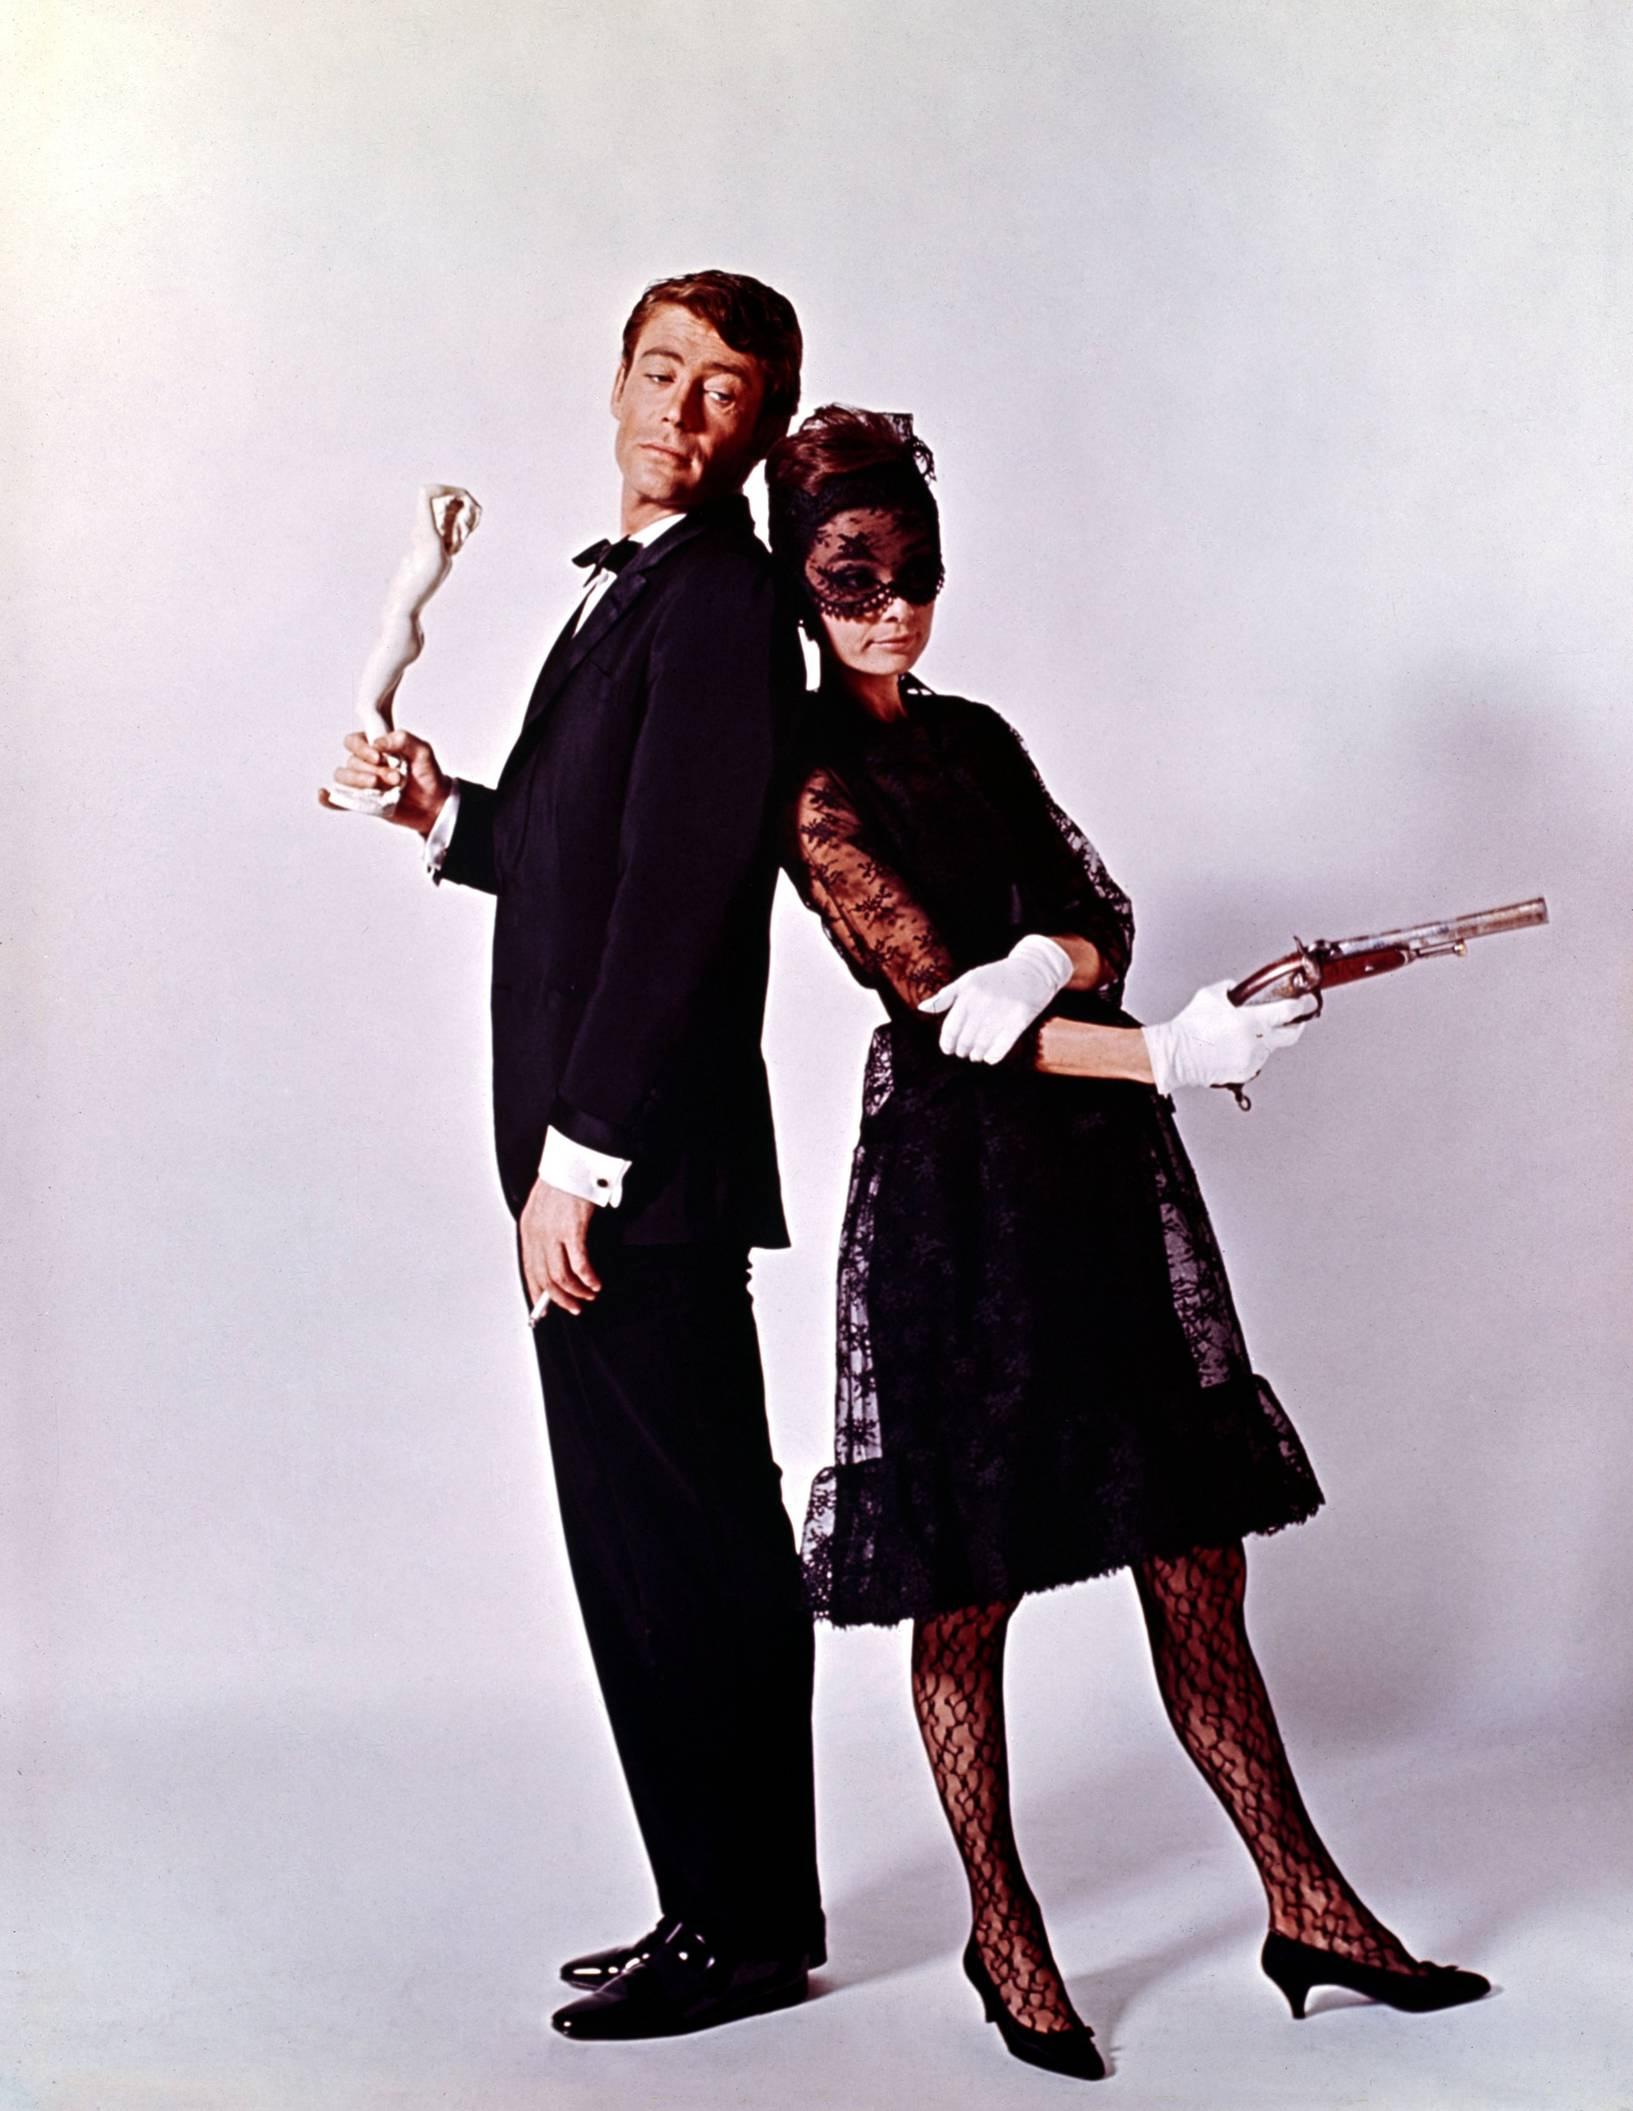 Annex - Hepburn, Audrey (How to Steal a Million)_15